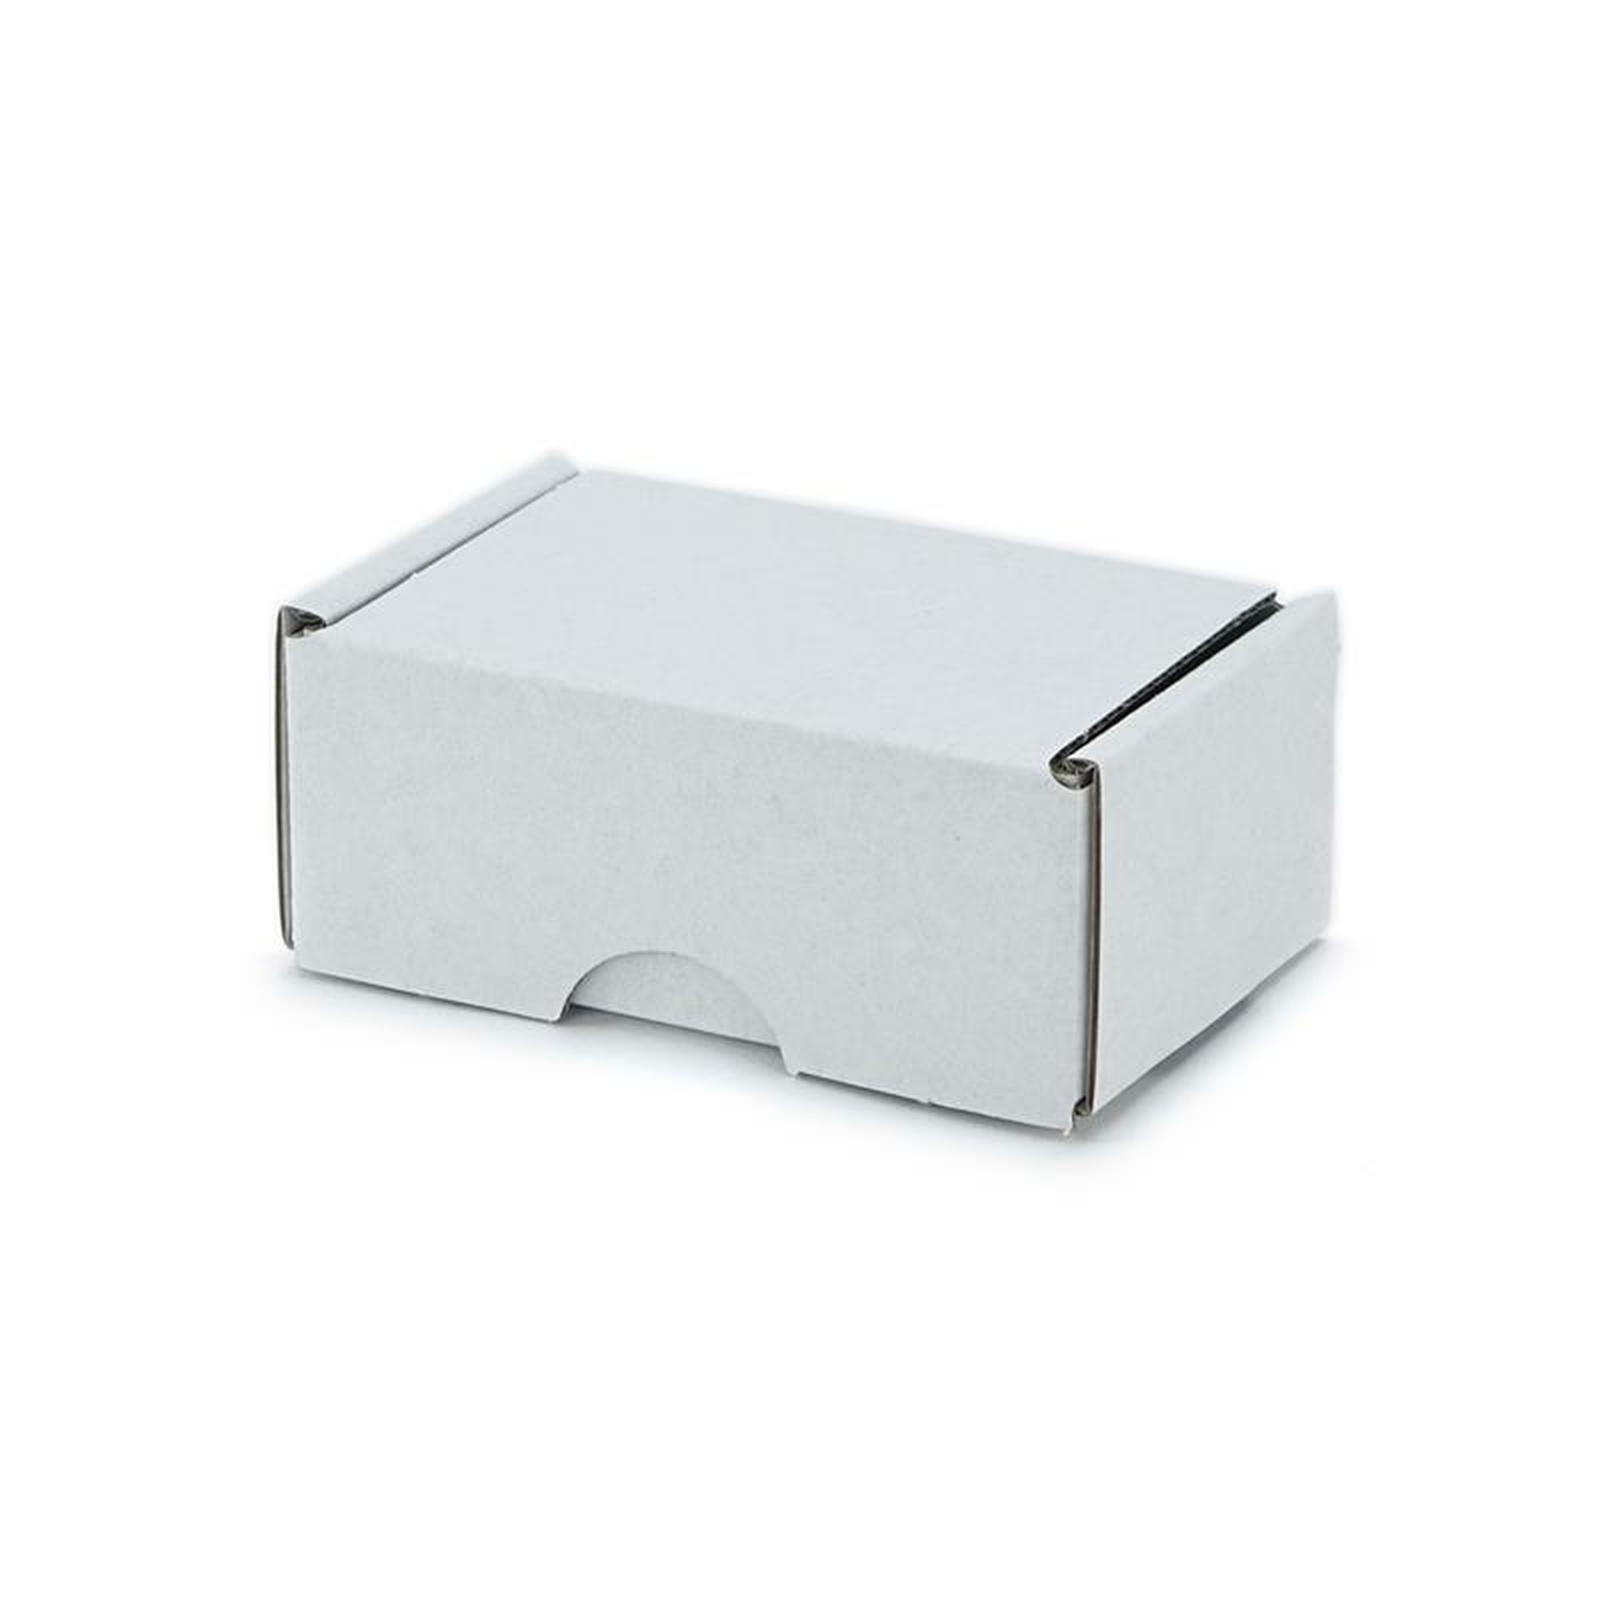 90x60x40 Mm Visitenkarten Schachtel Weiß